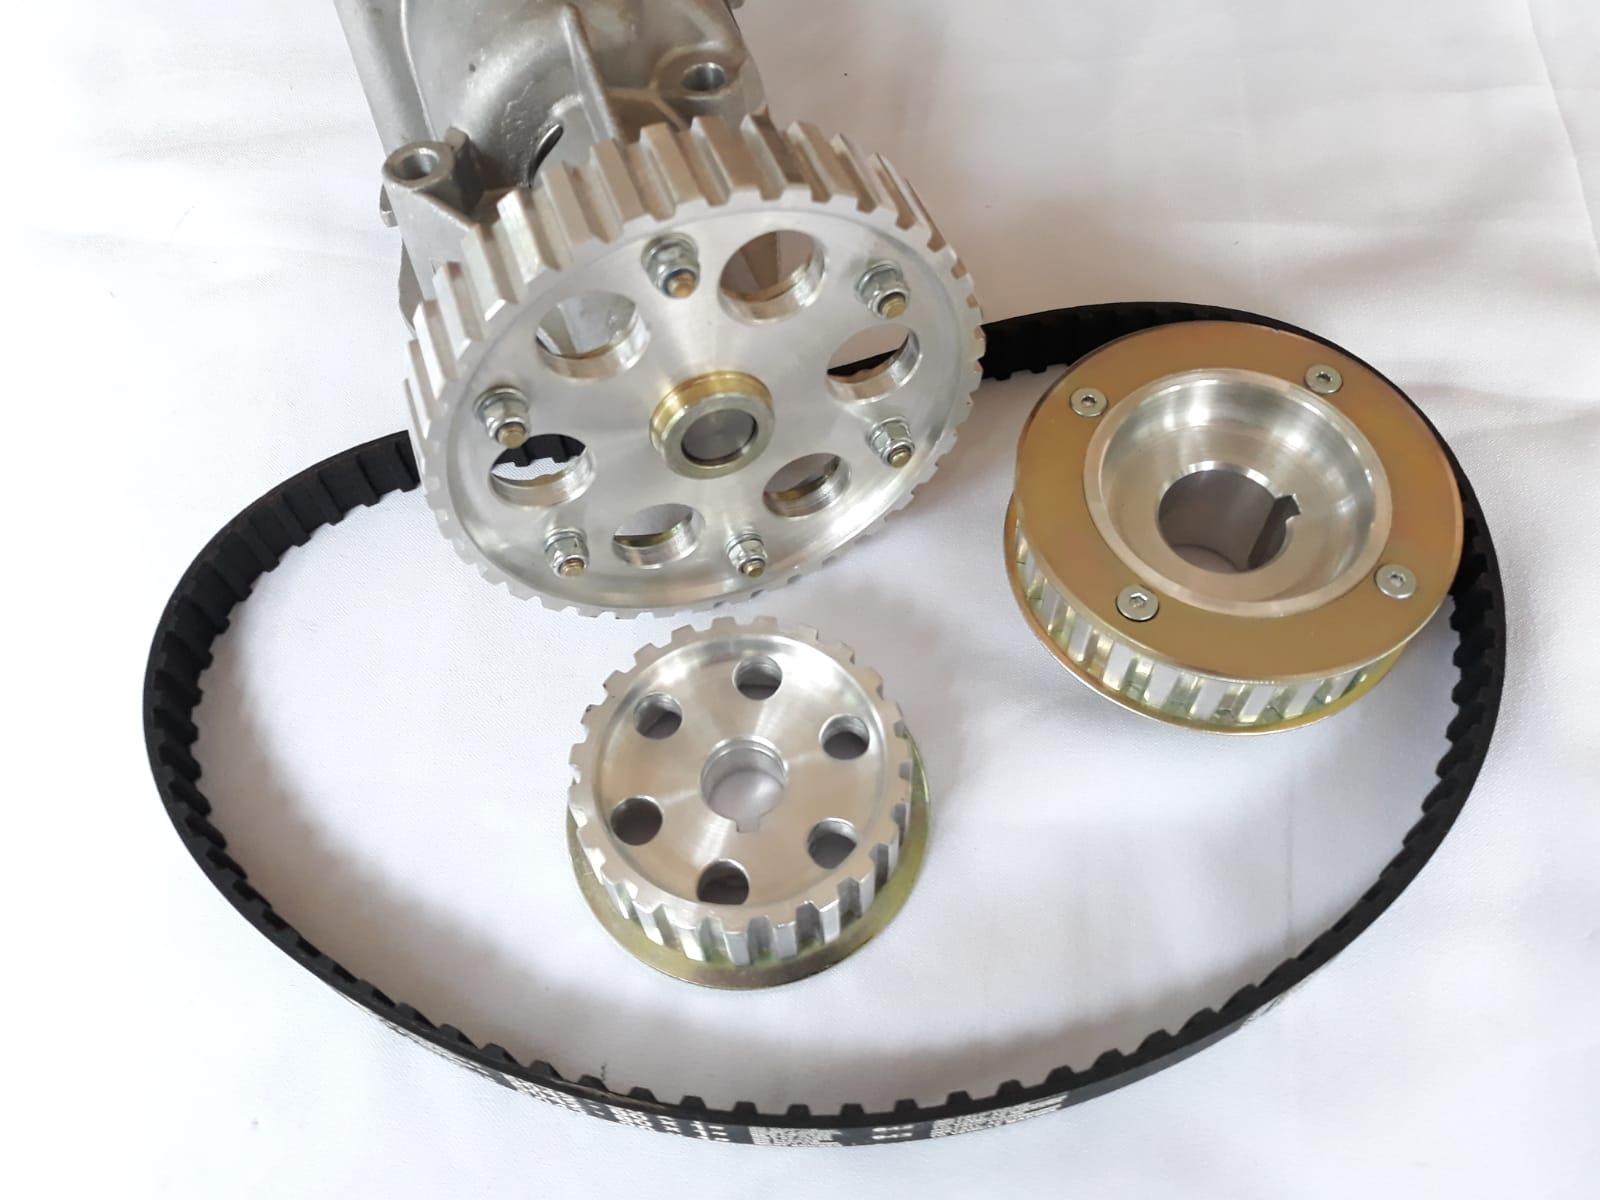 Parts Fiat Uno Alternator Parts And Components Car Parts Diagram